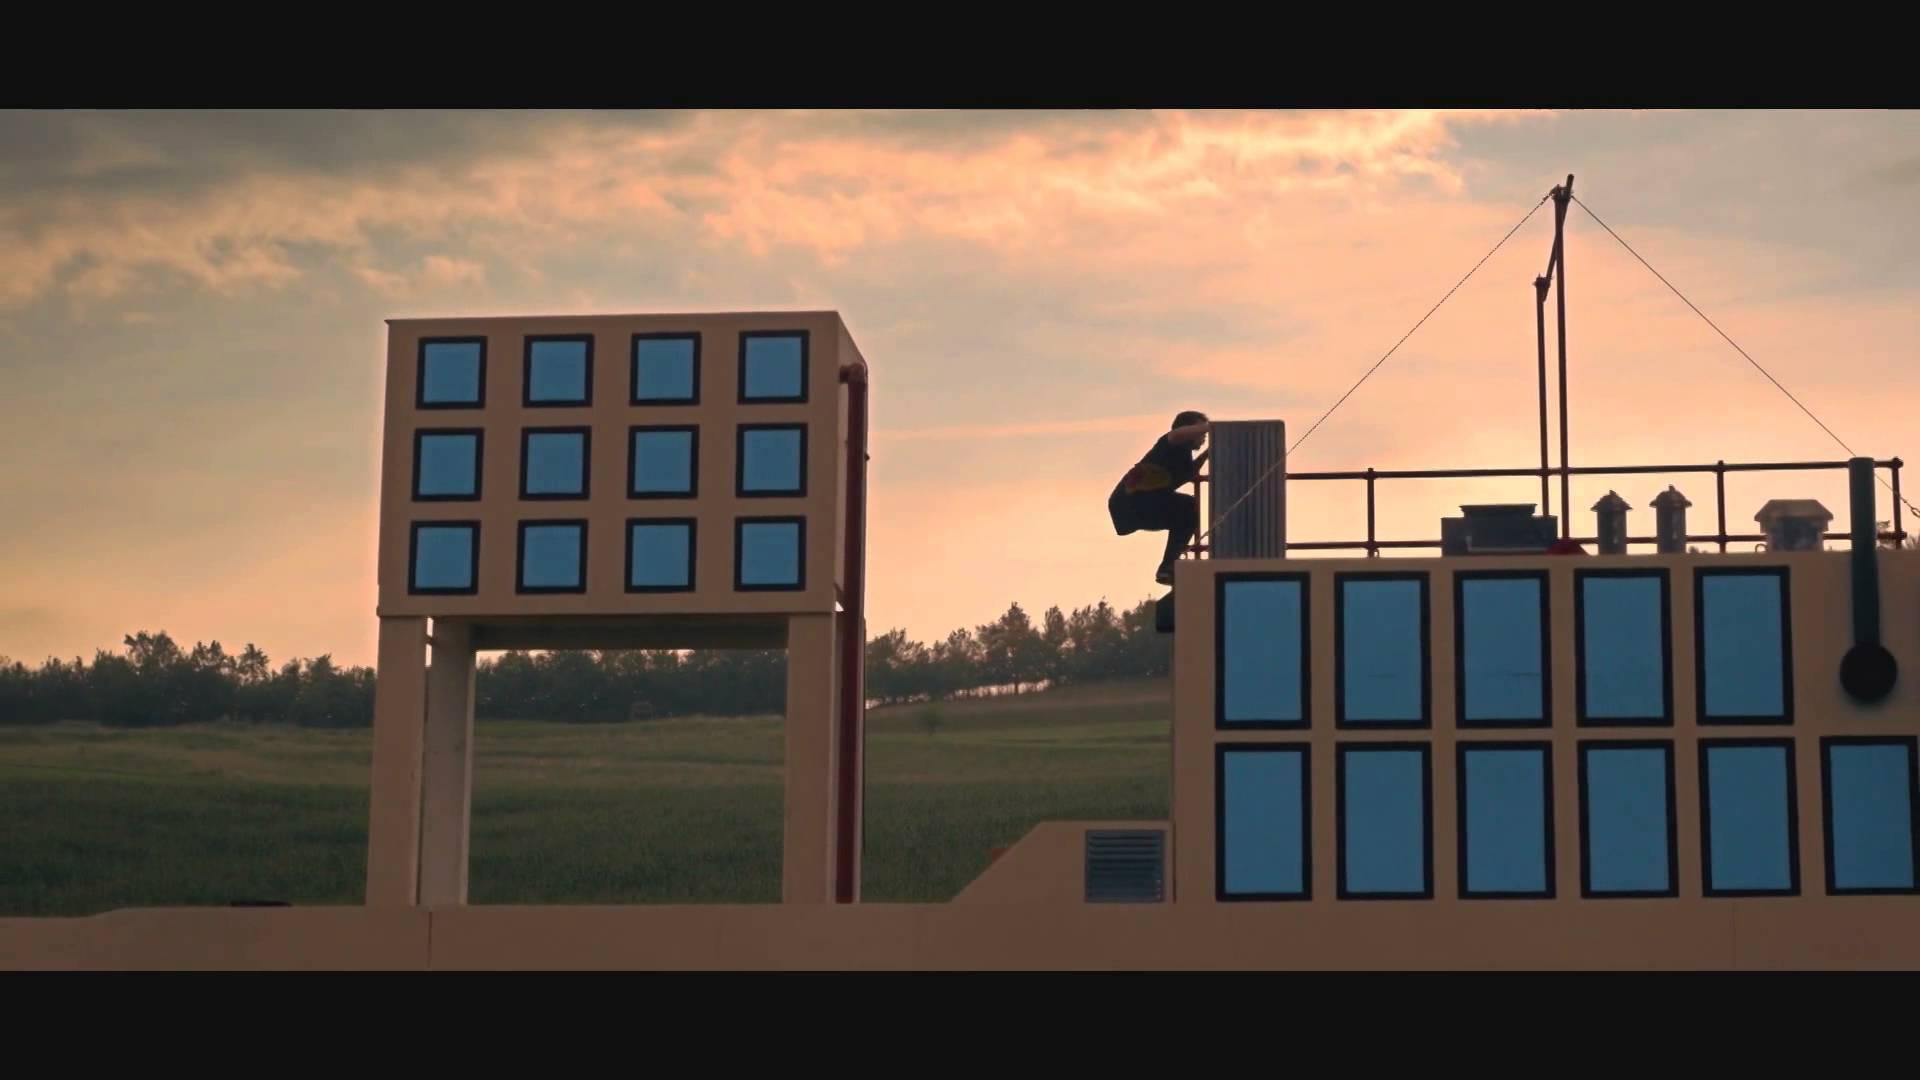 Un freerunner dans un jeu vidéo 8 bit